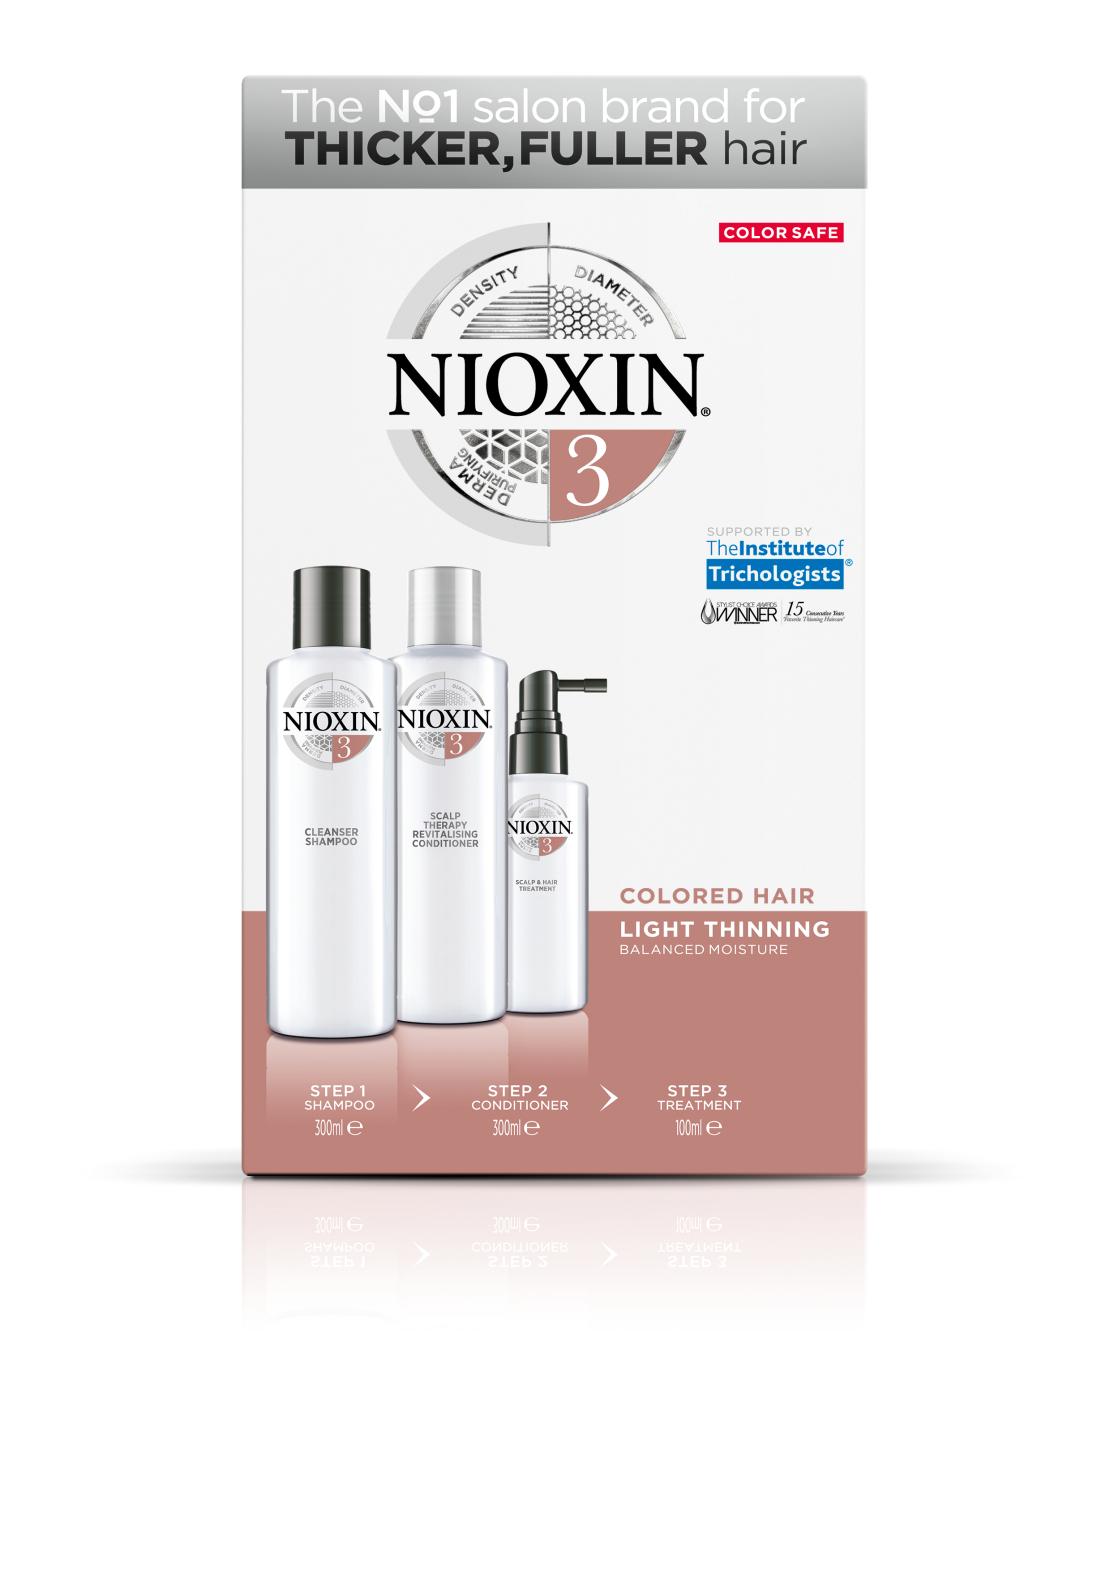 NIOXIN קיט טיפול לשיער צבוע ודליל למראה שיער צפוץ וצבע עז-סדרה 3